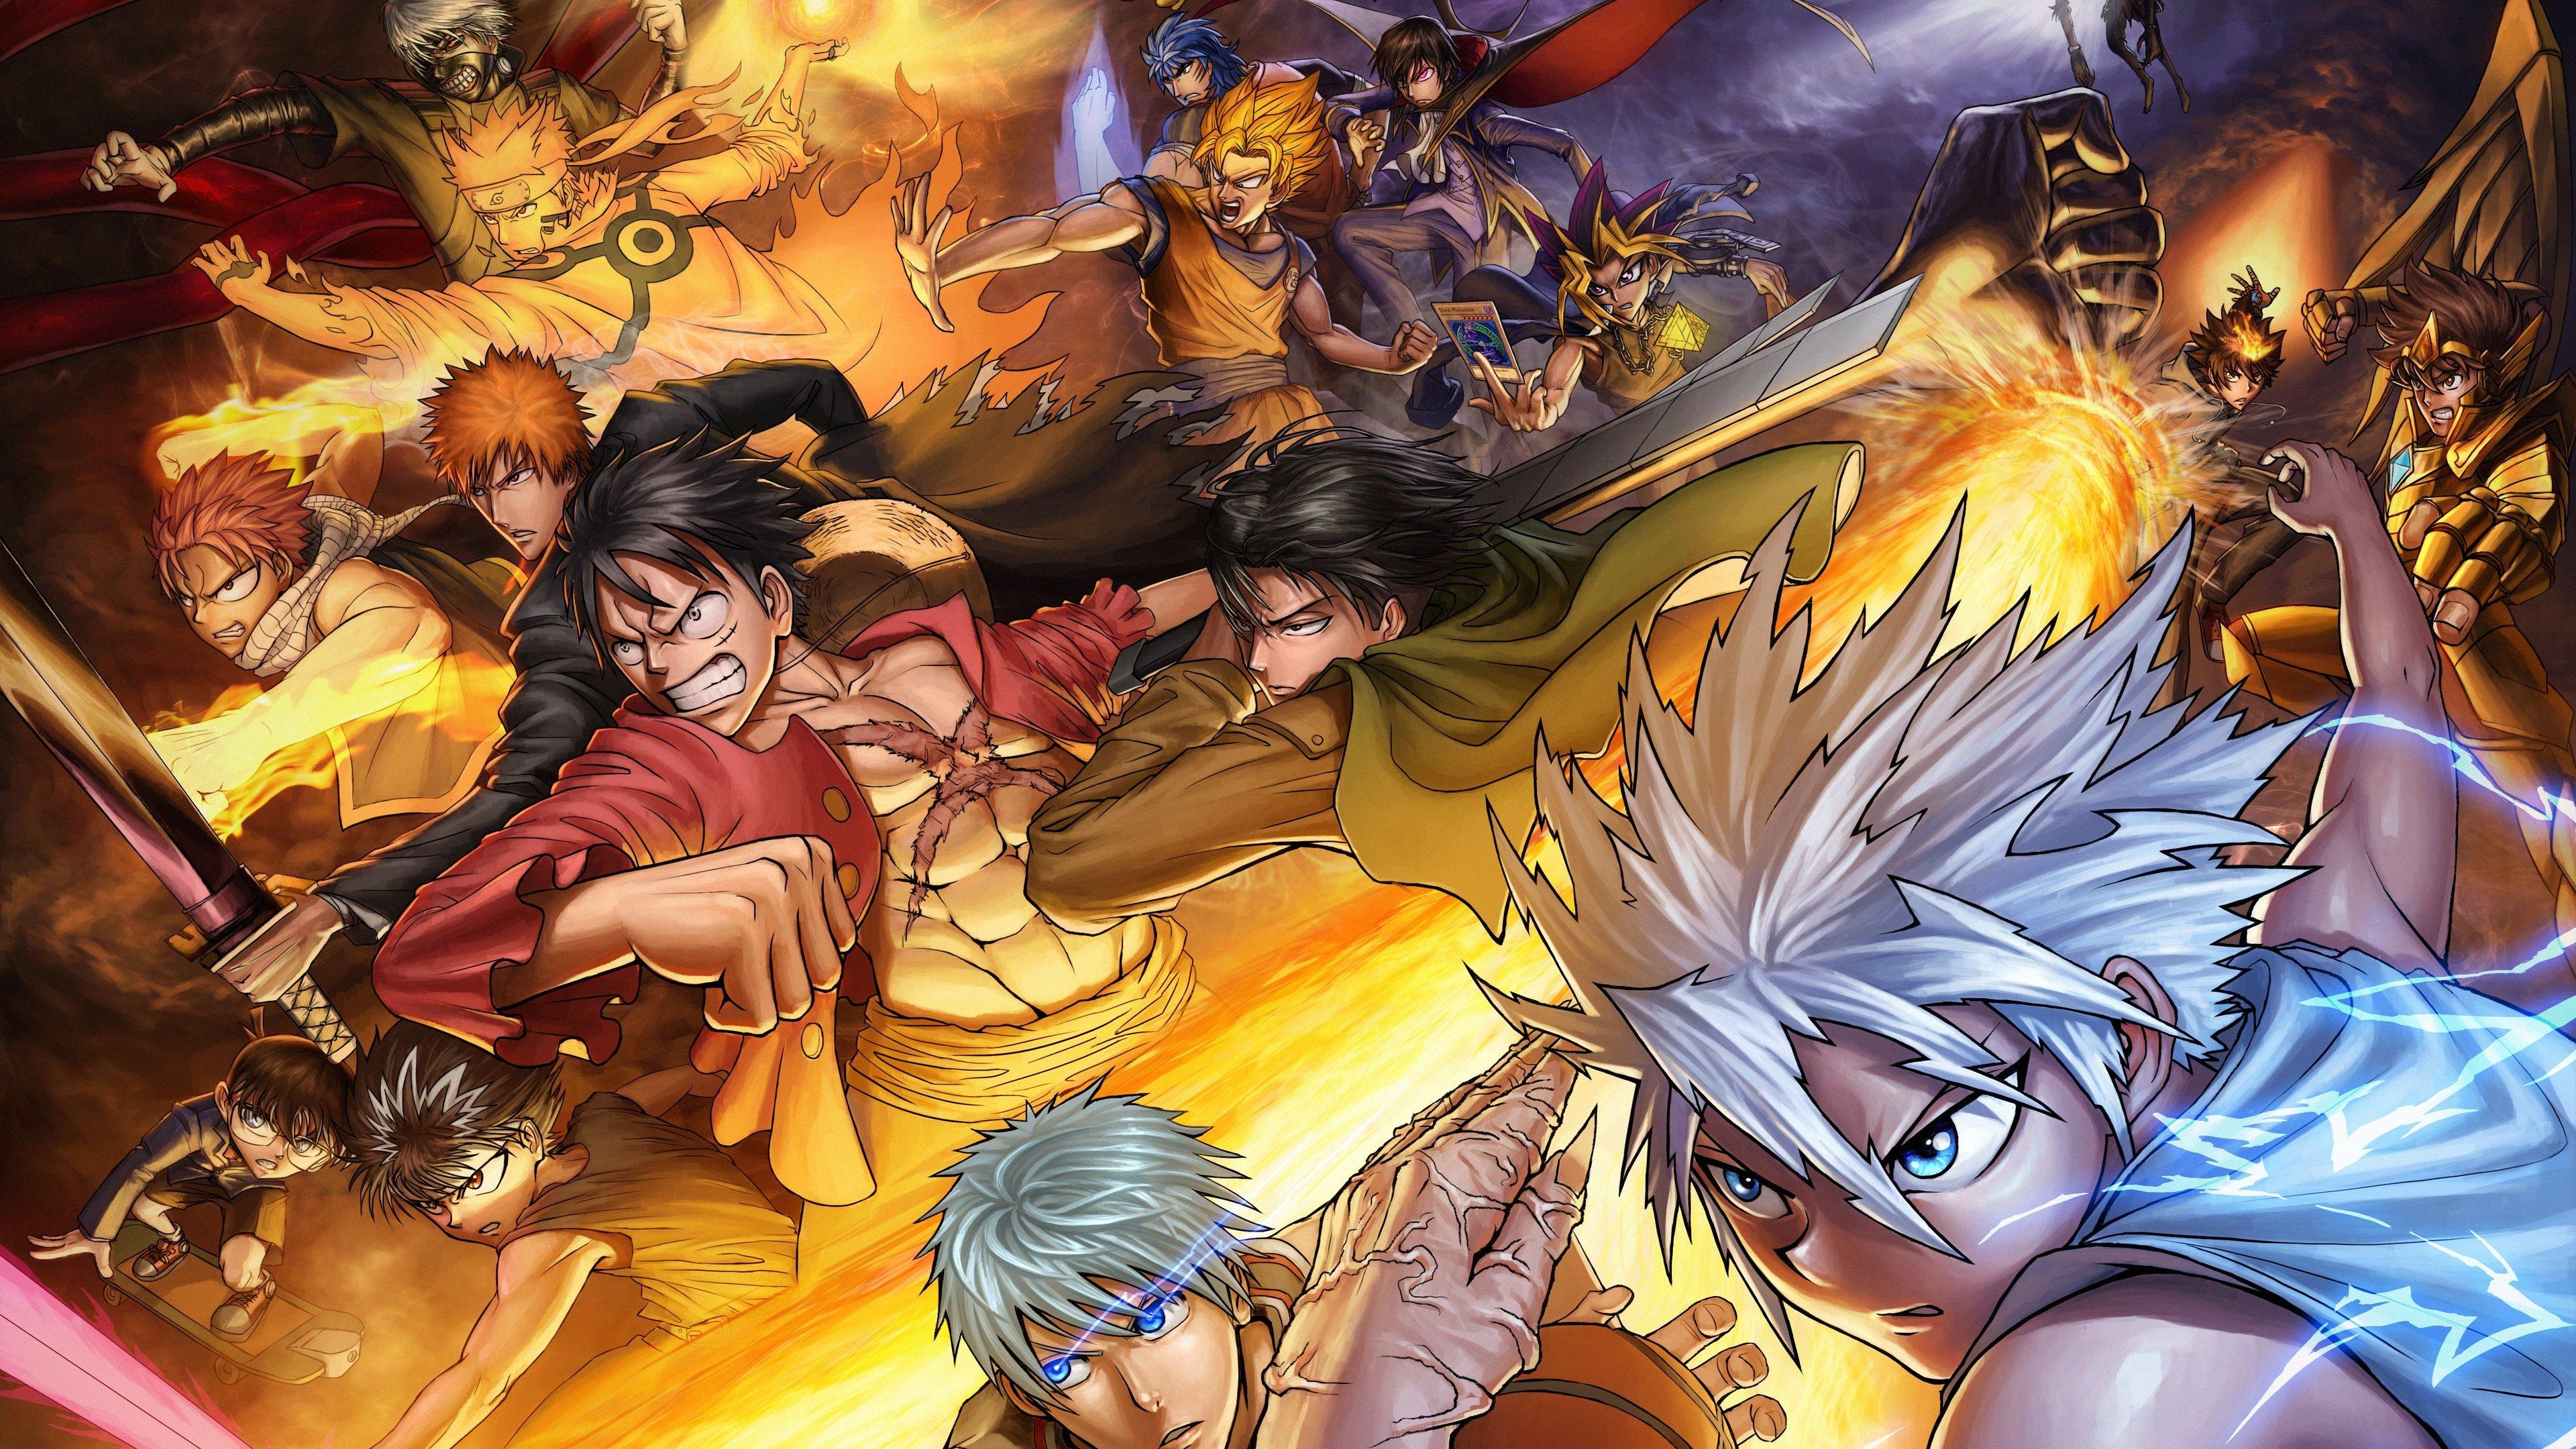 Atemu Bleach Crossover Dragonball Naruto naruto wallpapers ...